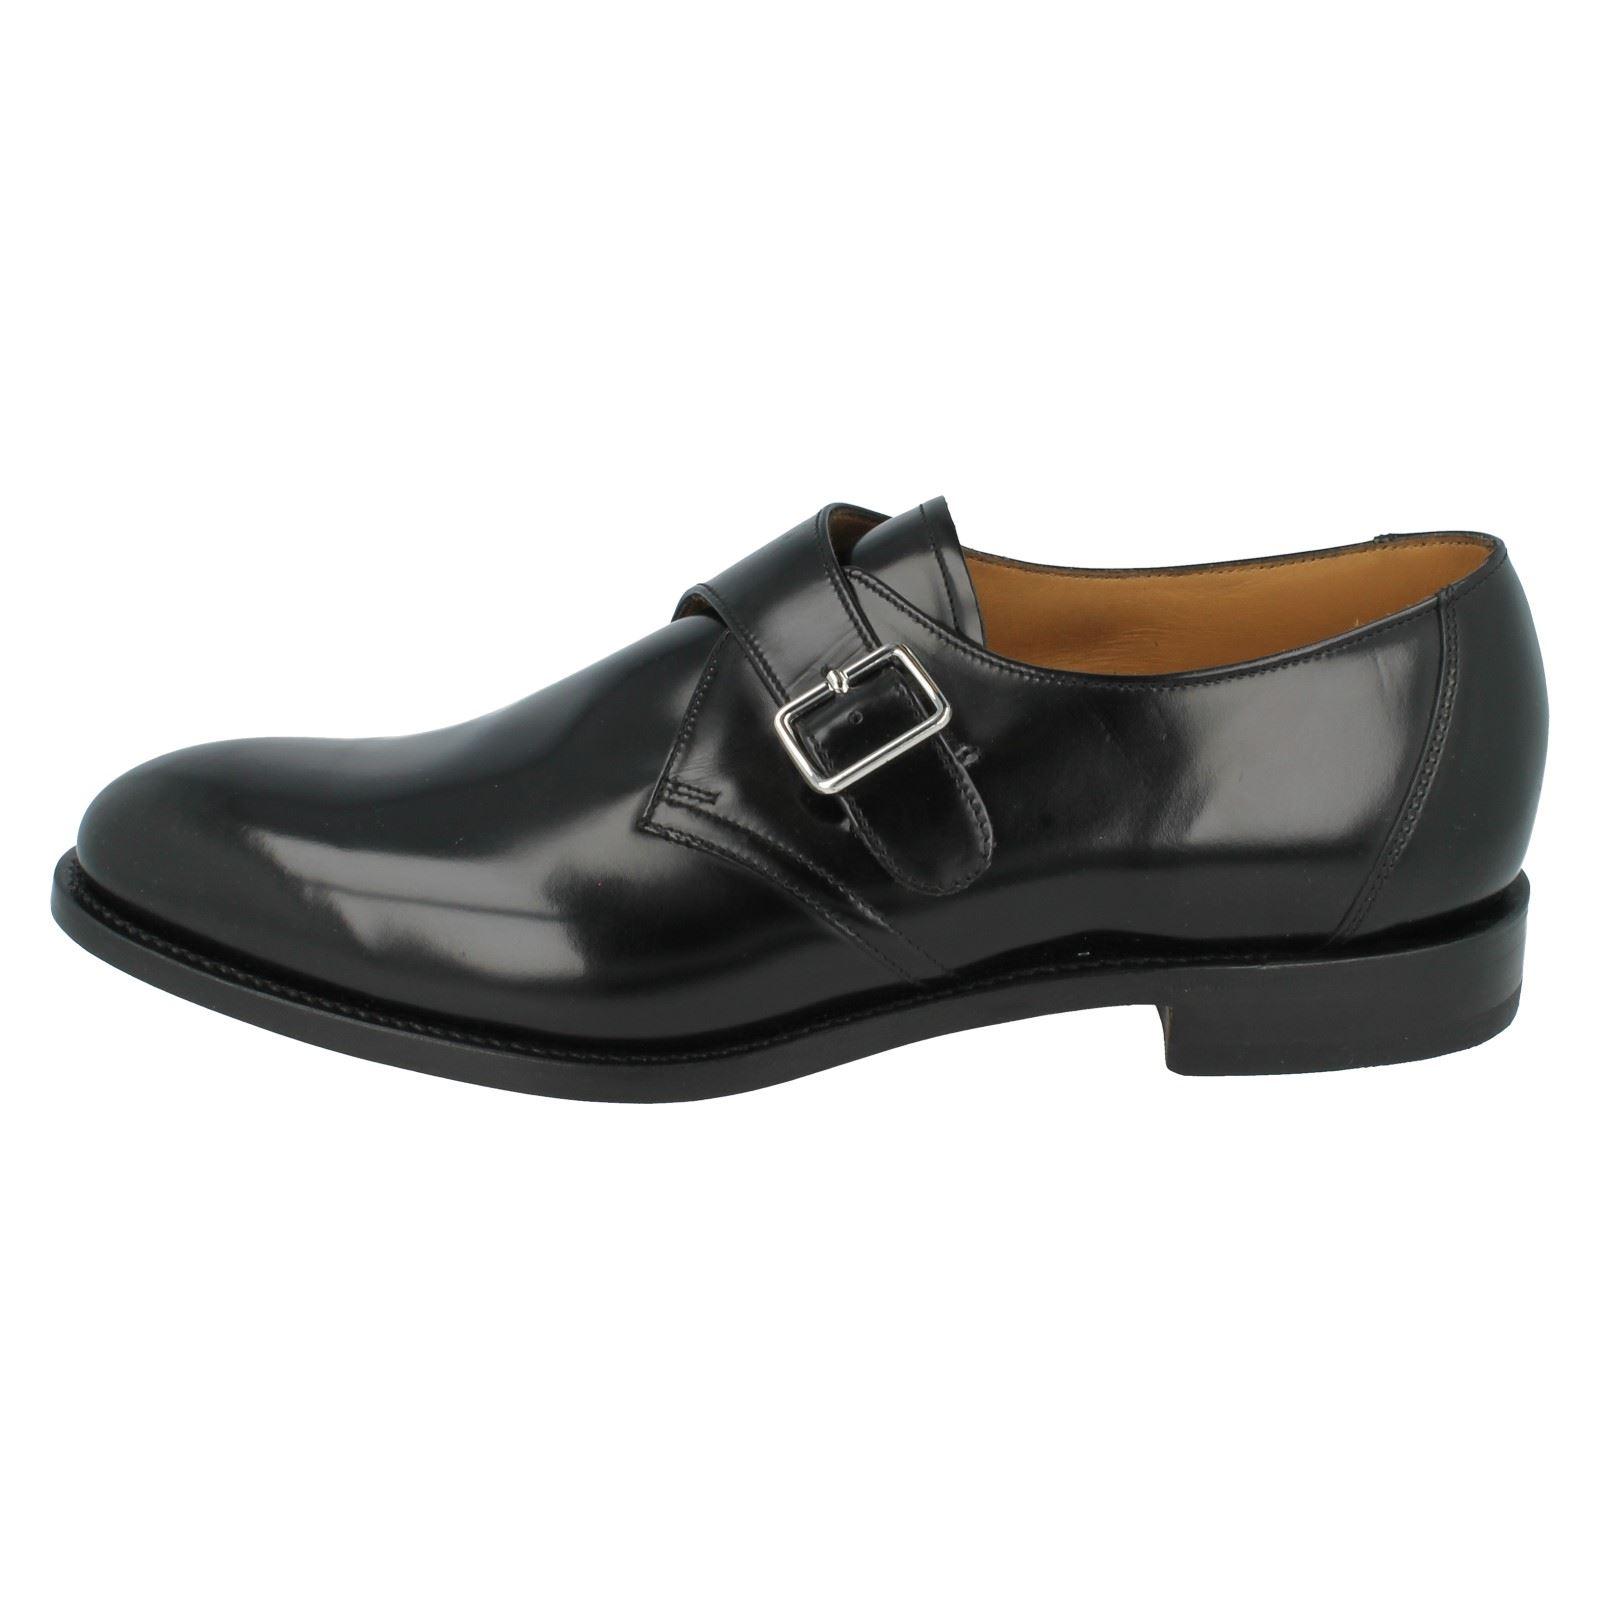 Aa Fitting Shoes Uk